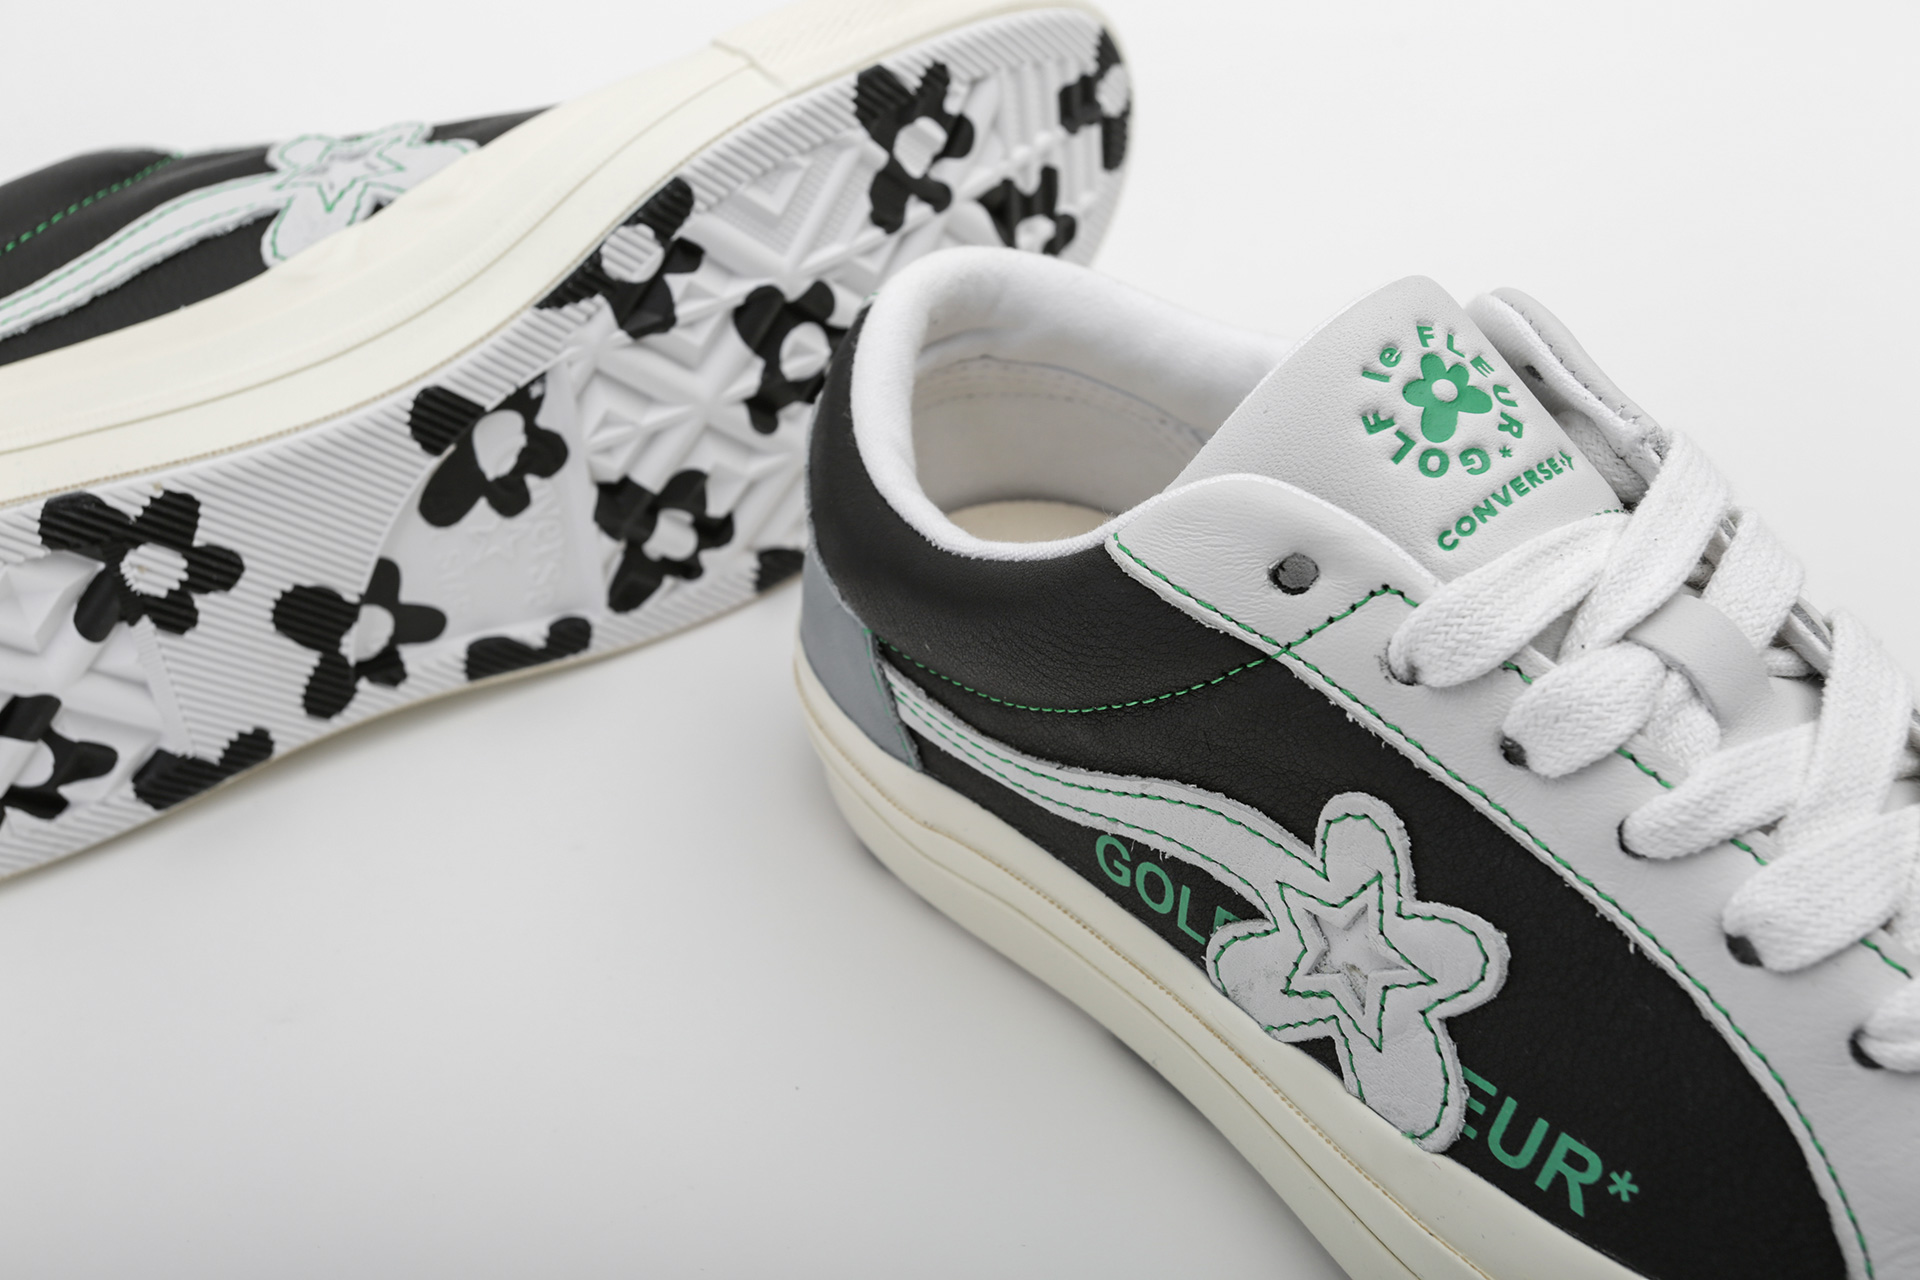 7bfb46e8 ... Купить мужские серые кроссовки Converse One Star Golf Le Fleur OX -  фото 2 картинки ...